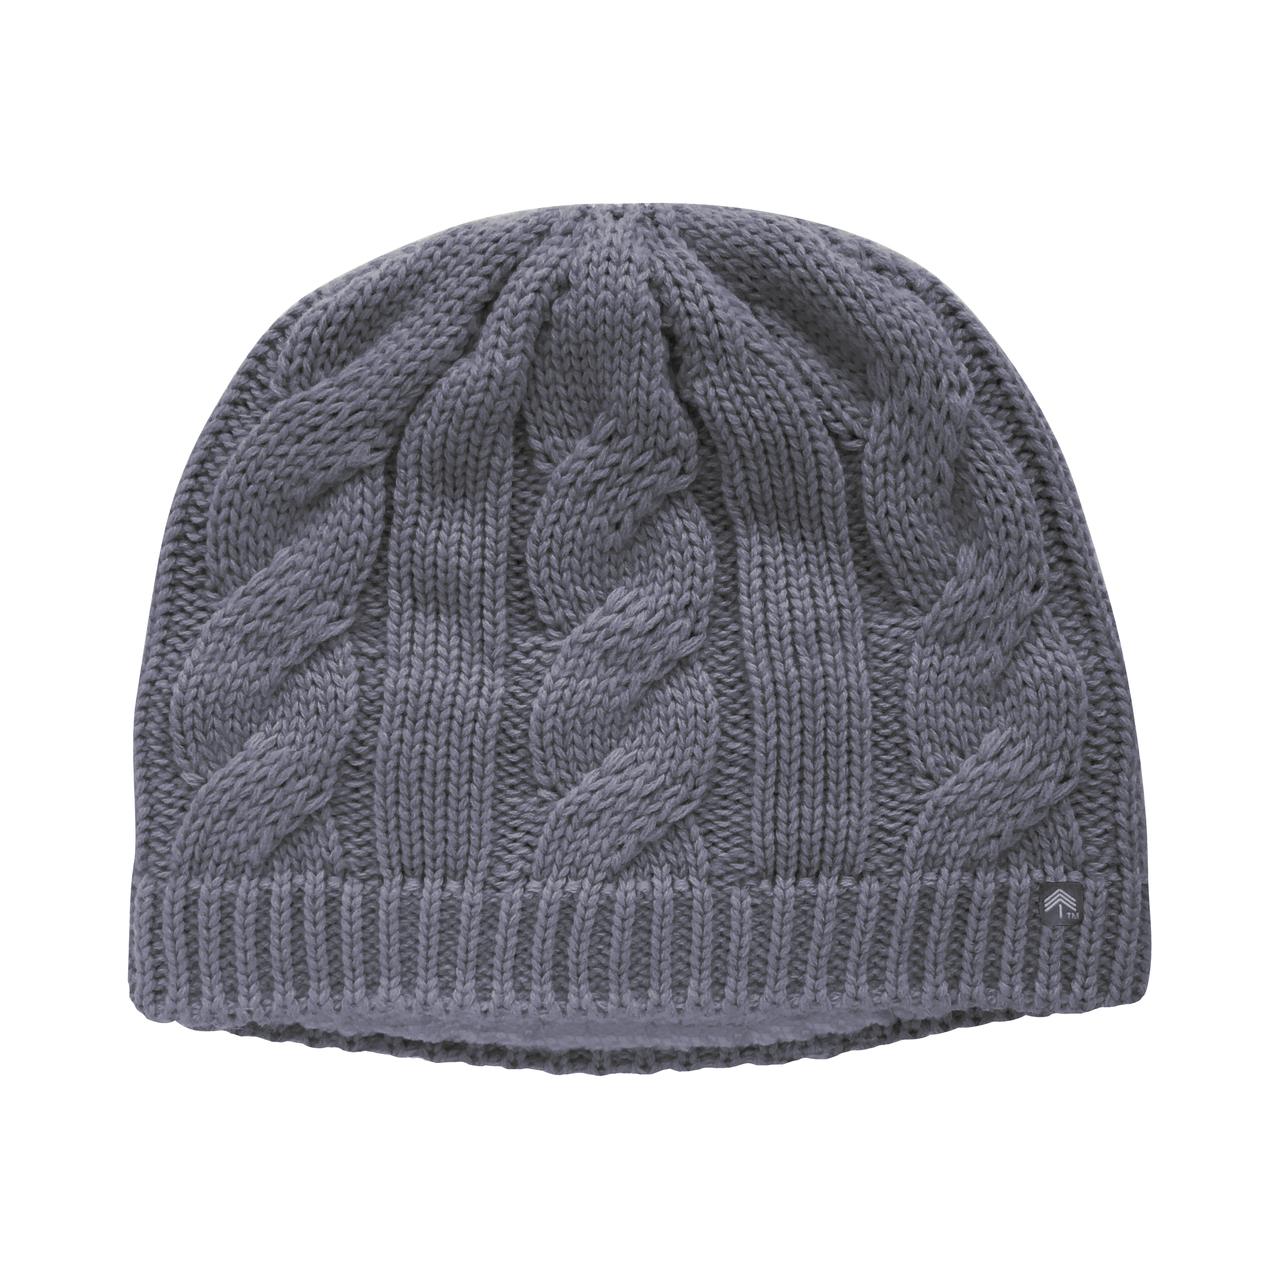 606723bc15c Winter (medium gray) - Classic Cable Ponytail Hat - Adult Misses ...